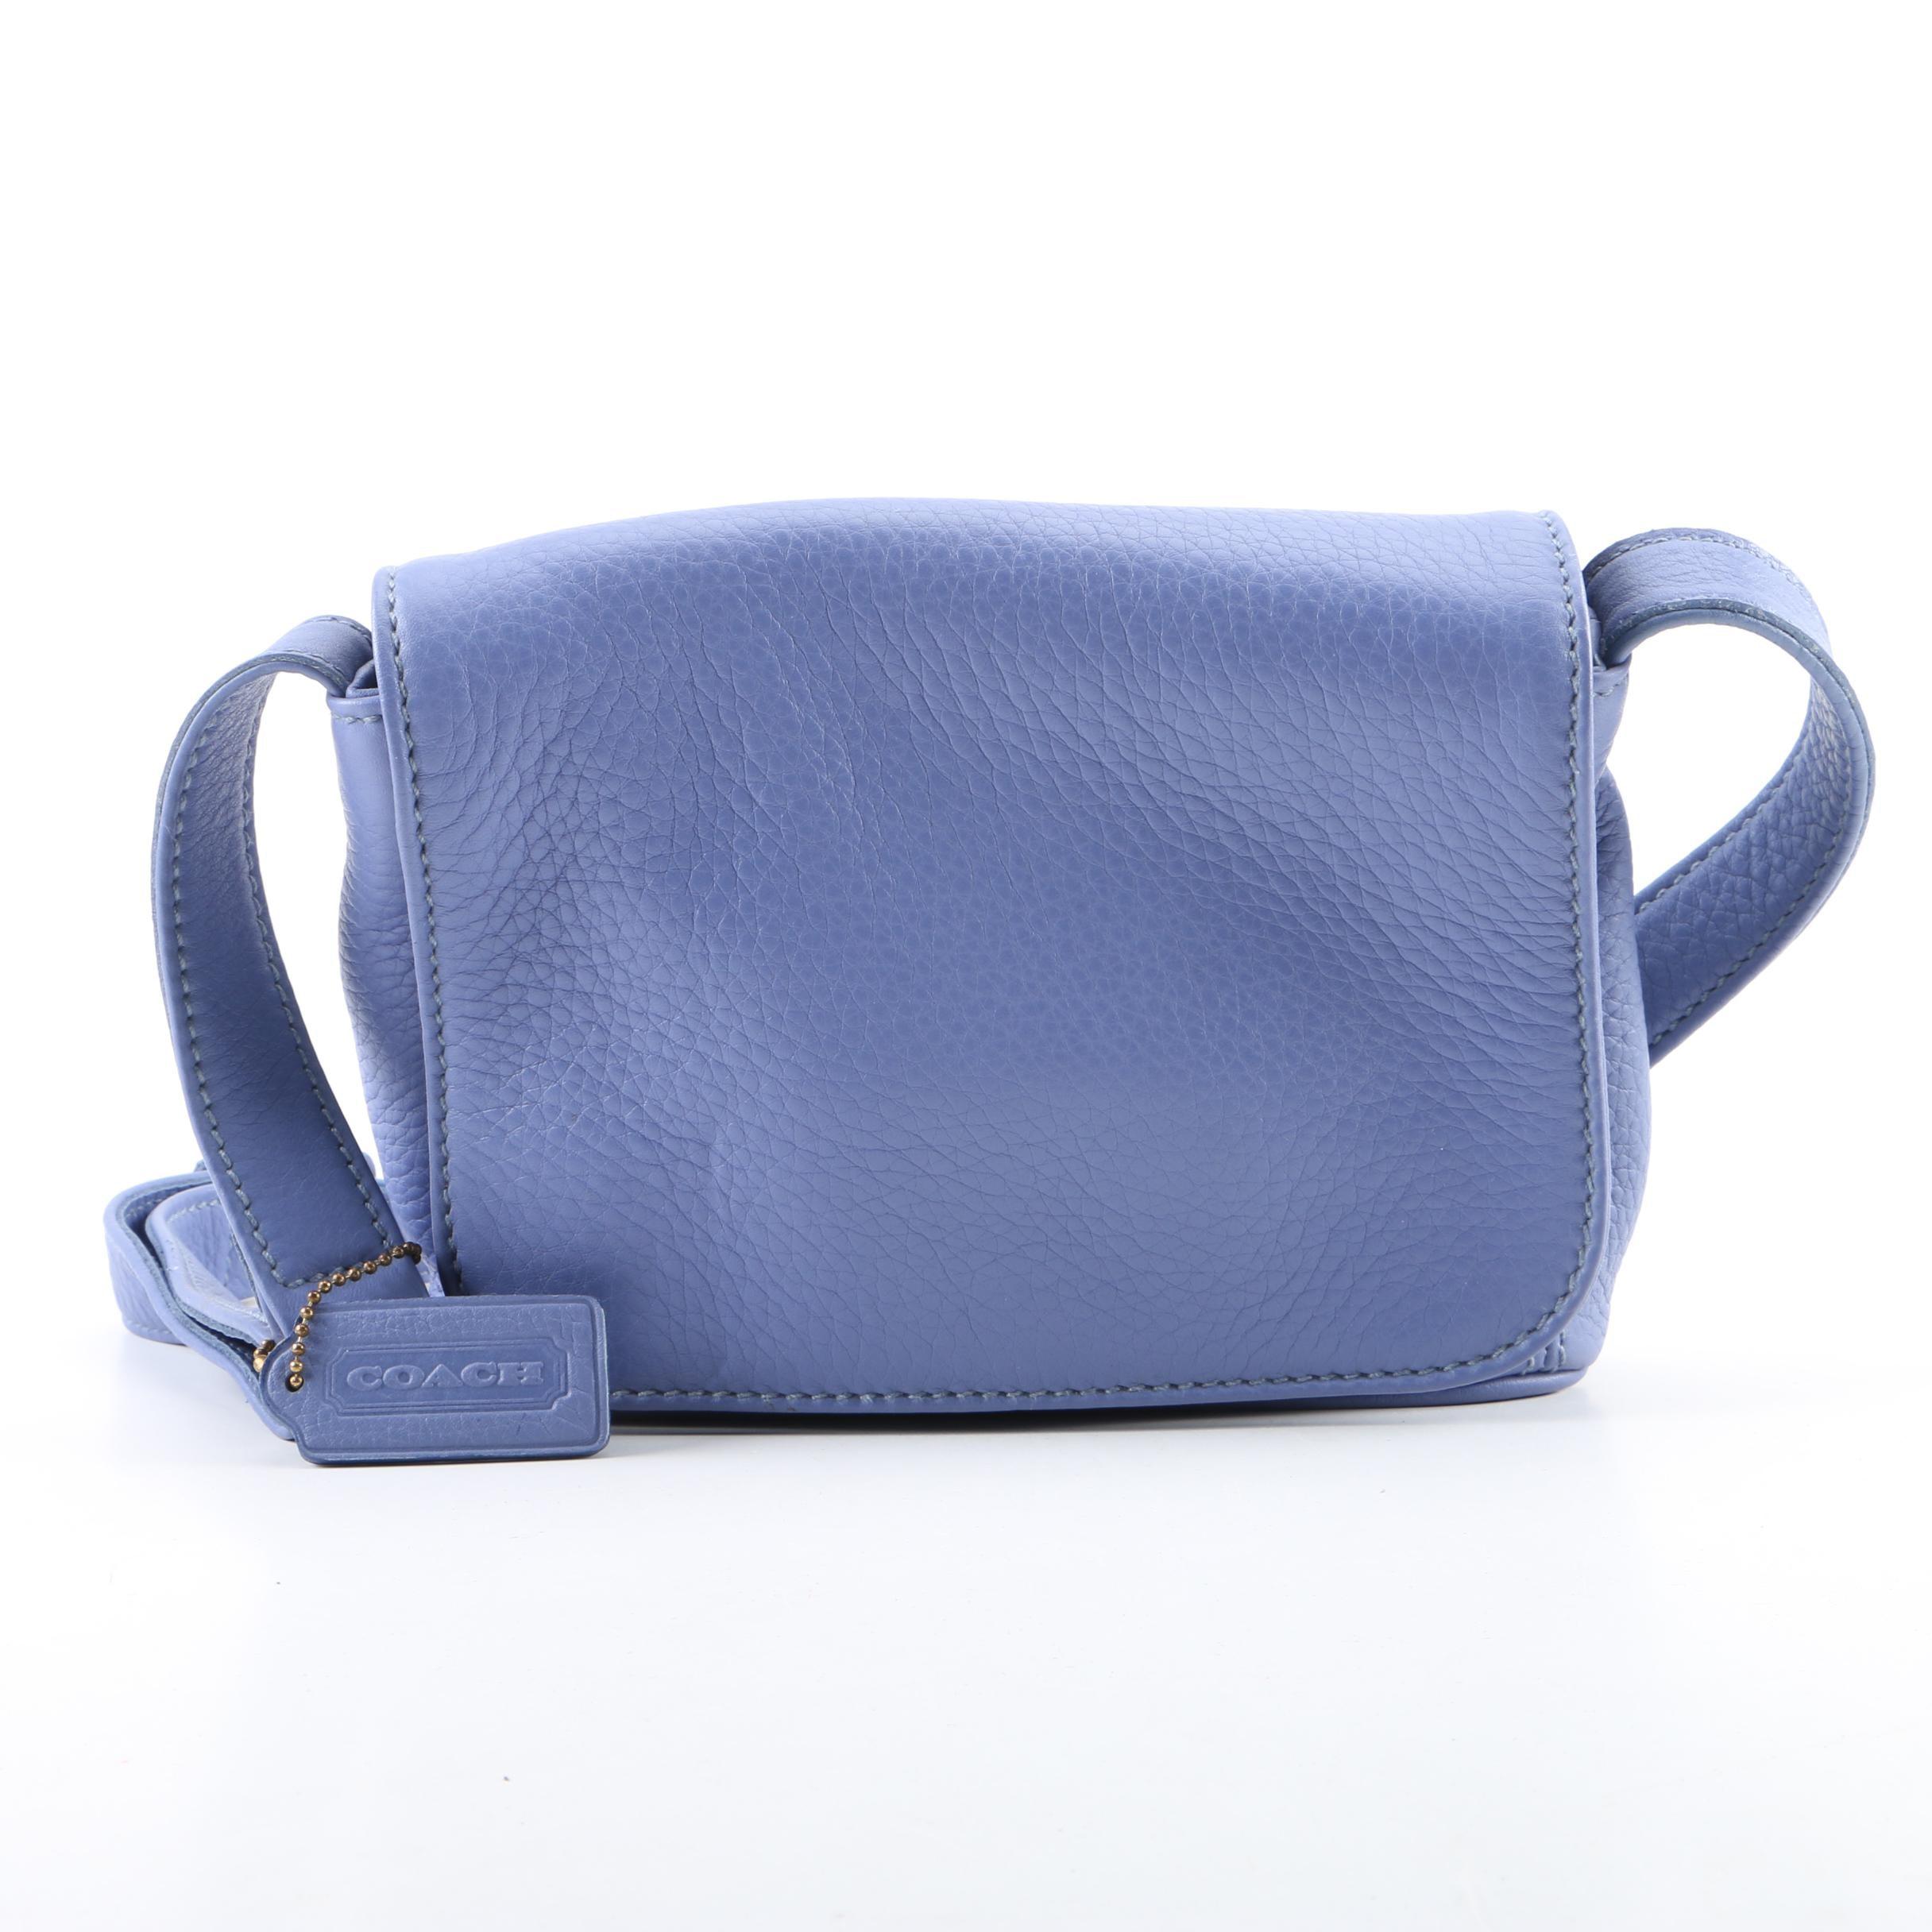 1997 Coach Sonoma Periwinkle Pebbled Leather Shoulder Bag